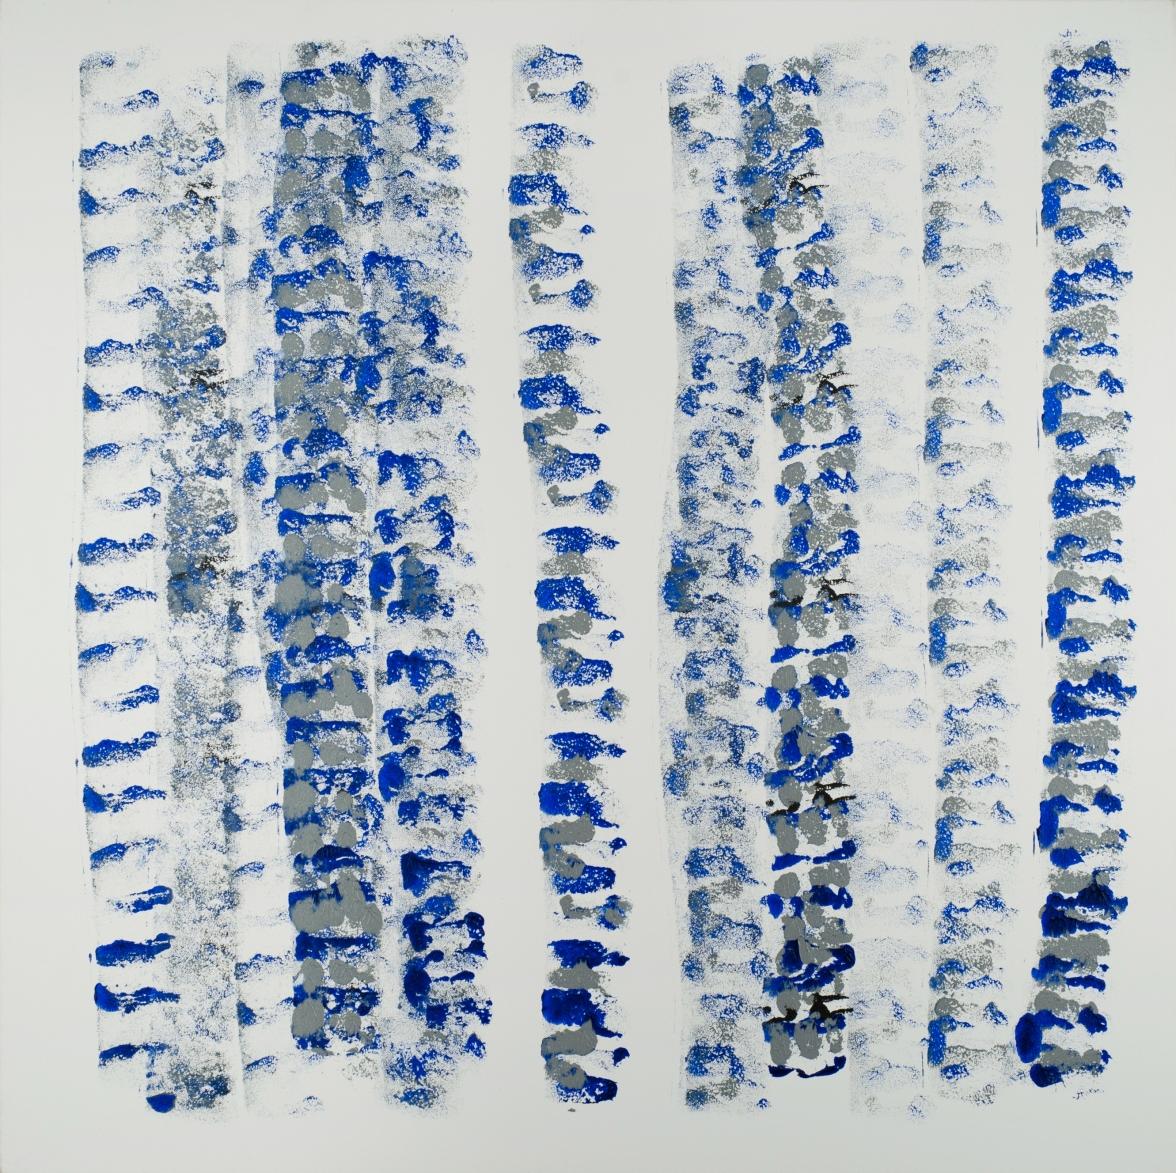 Verticales #3 Blue&GreyoW 2.2012 (36''x36'')